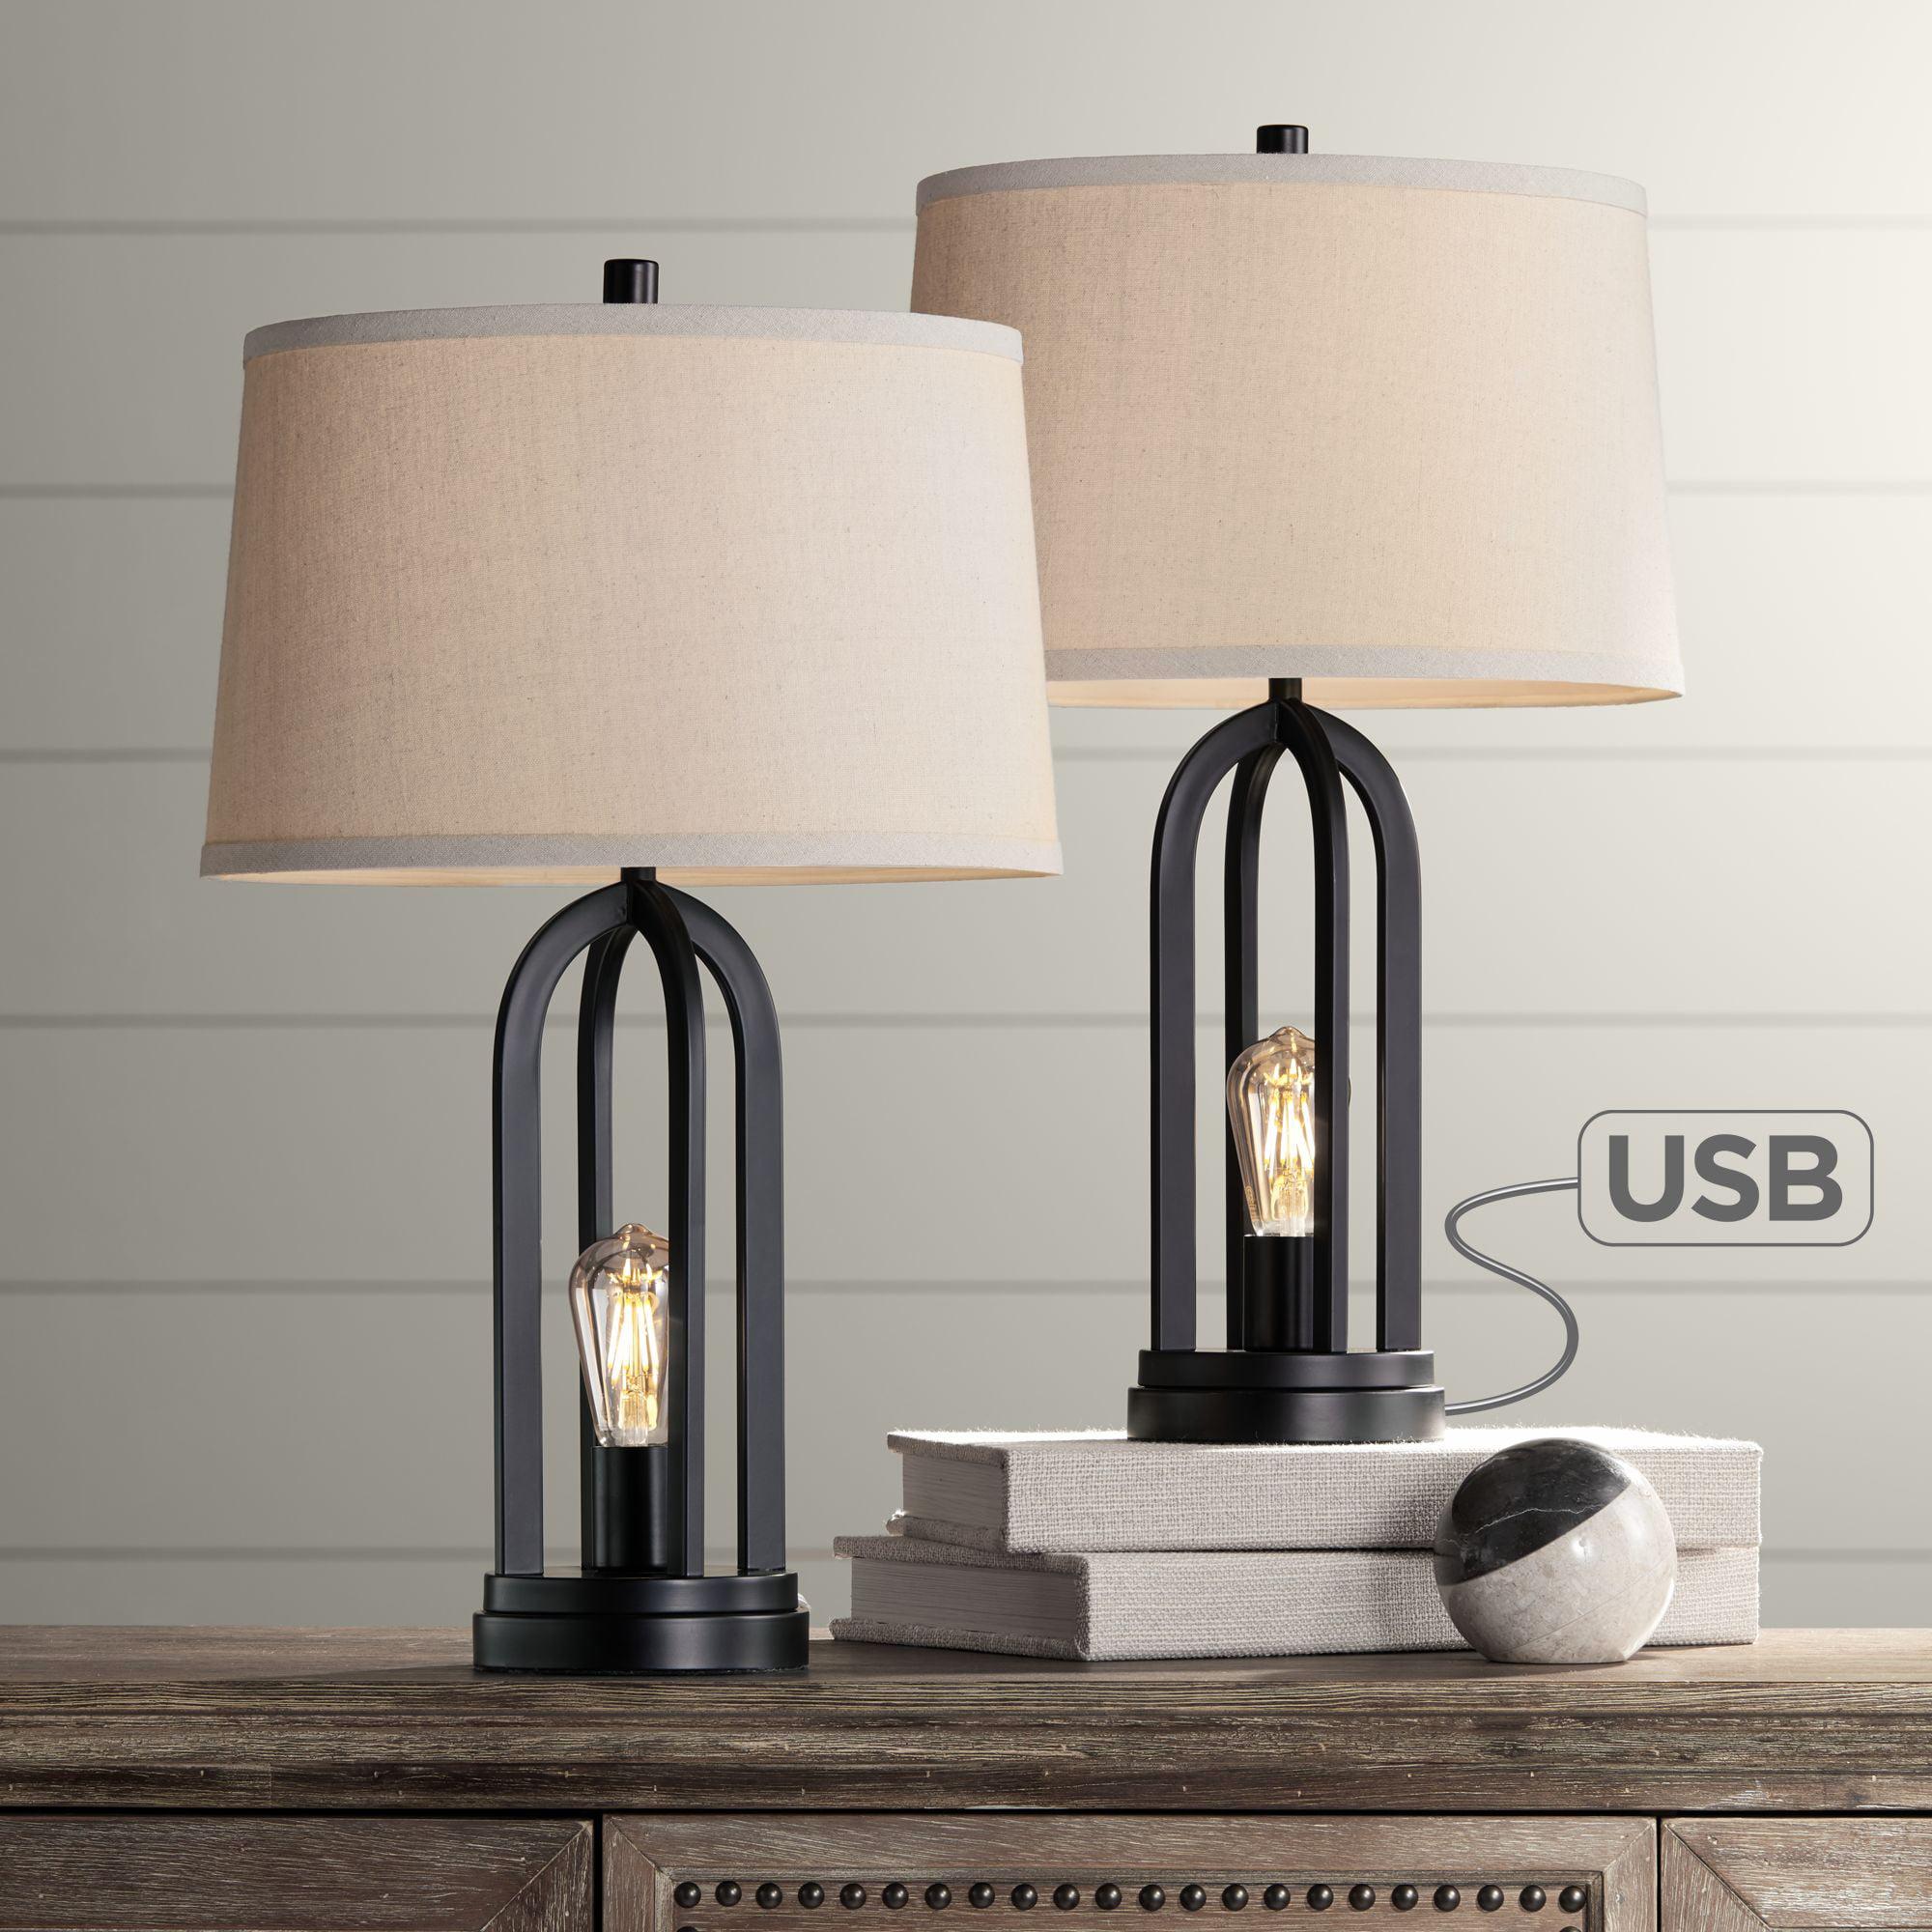 360 Lighting Modern Table Lamps Set Of 2 With Nightlight Led Usb Port Black Linen Shade For Living Room Bedroom Com